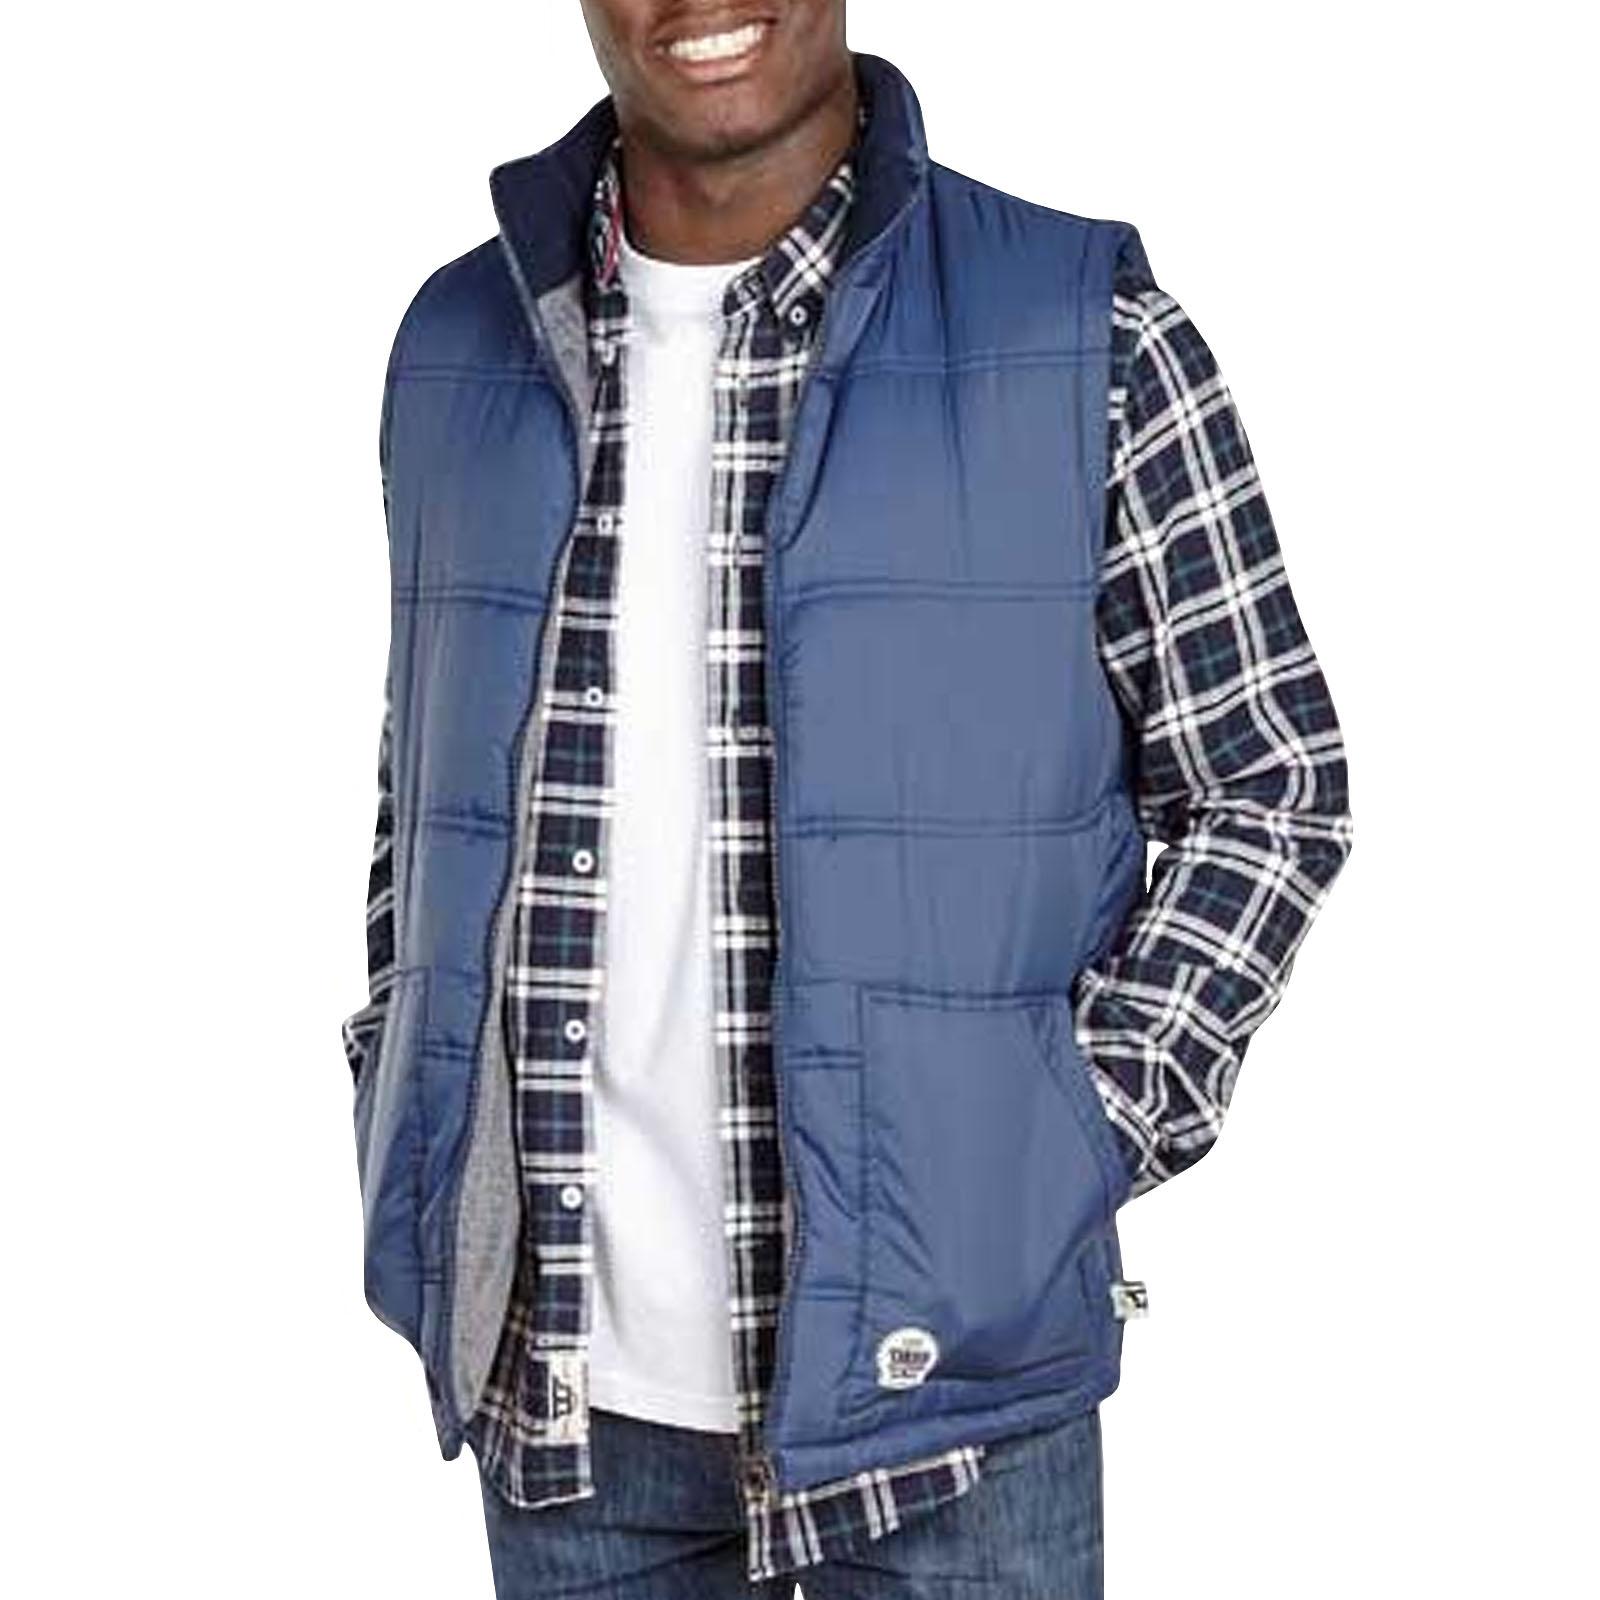 D555 Mens Shaun Big Tall King Size Sleeveless Bodywarmer Gilet Jacket Top